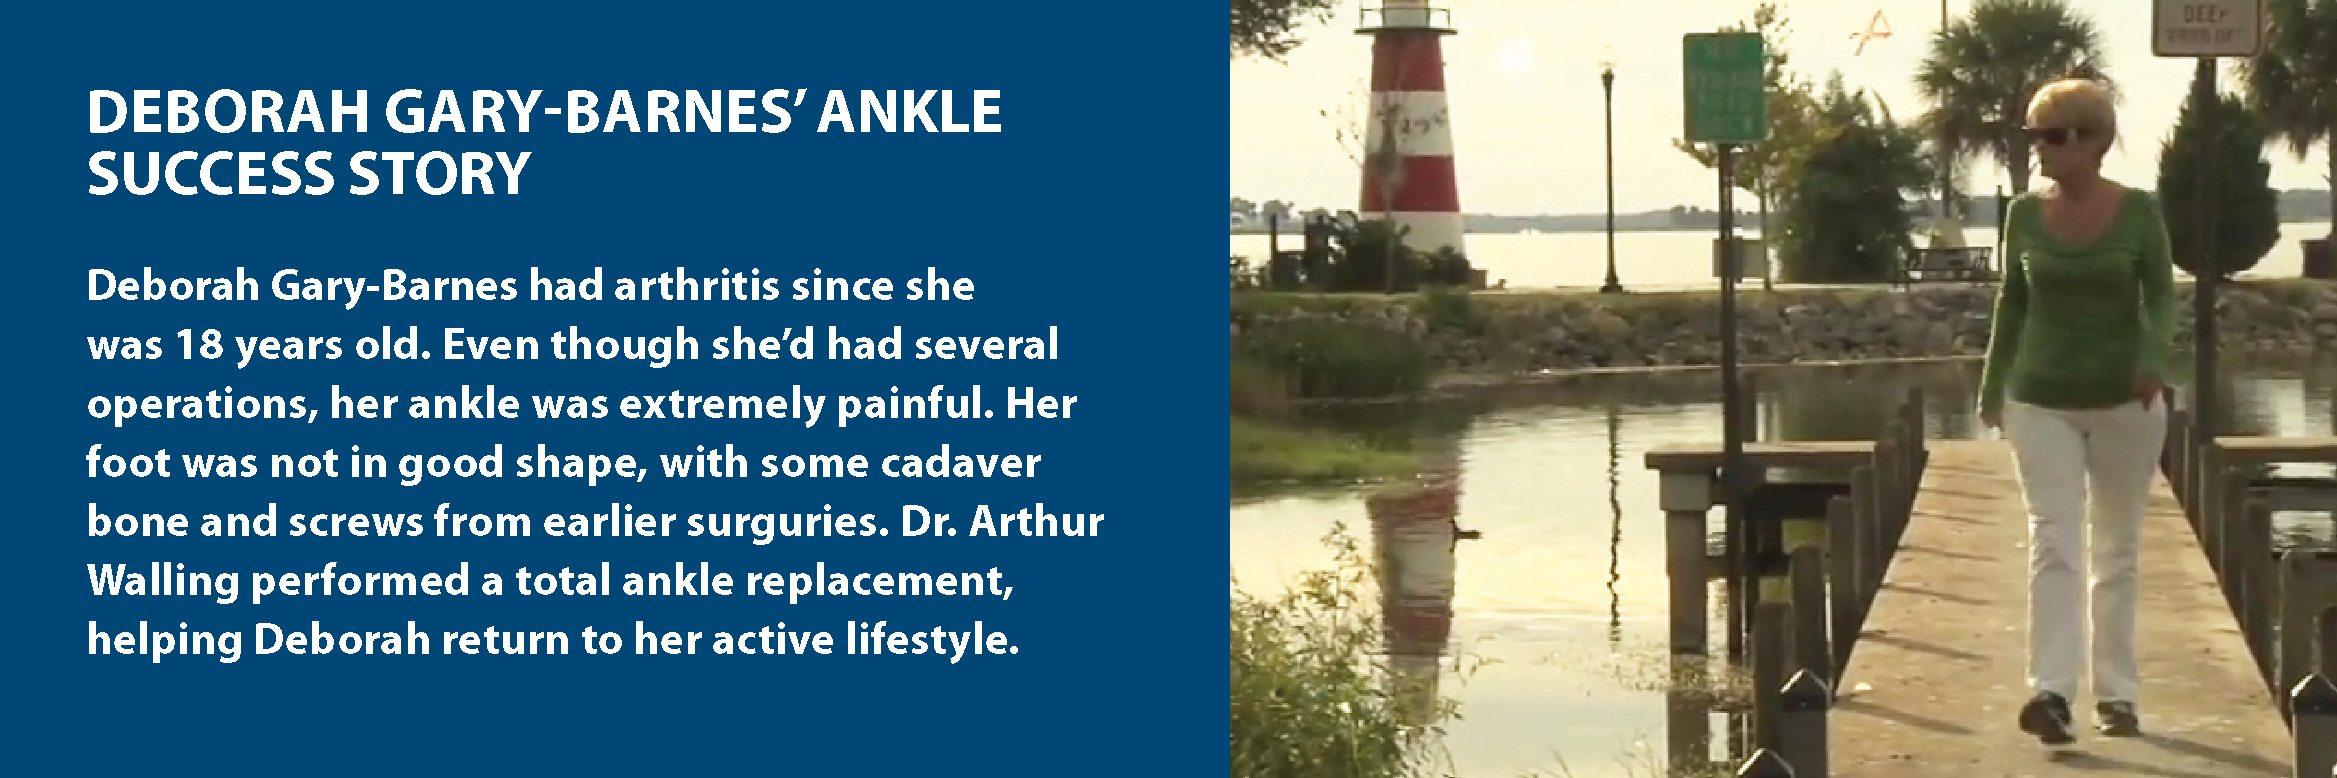 Foot Ankle Lower Leg Florida Orthopaedic Institute